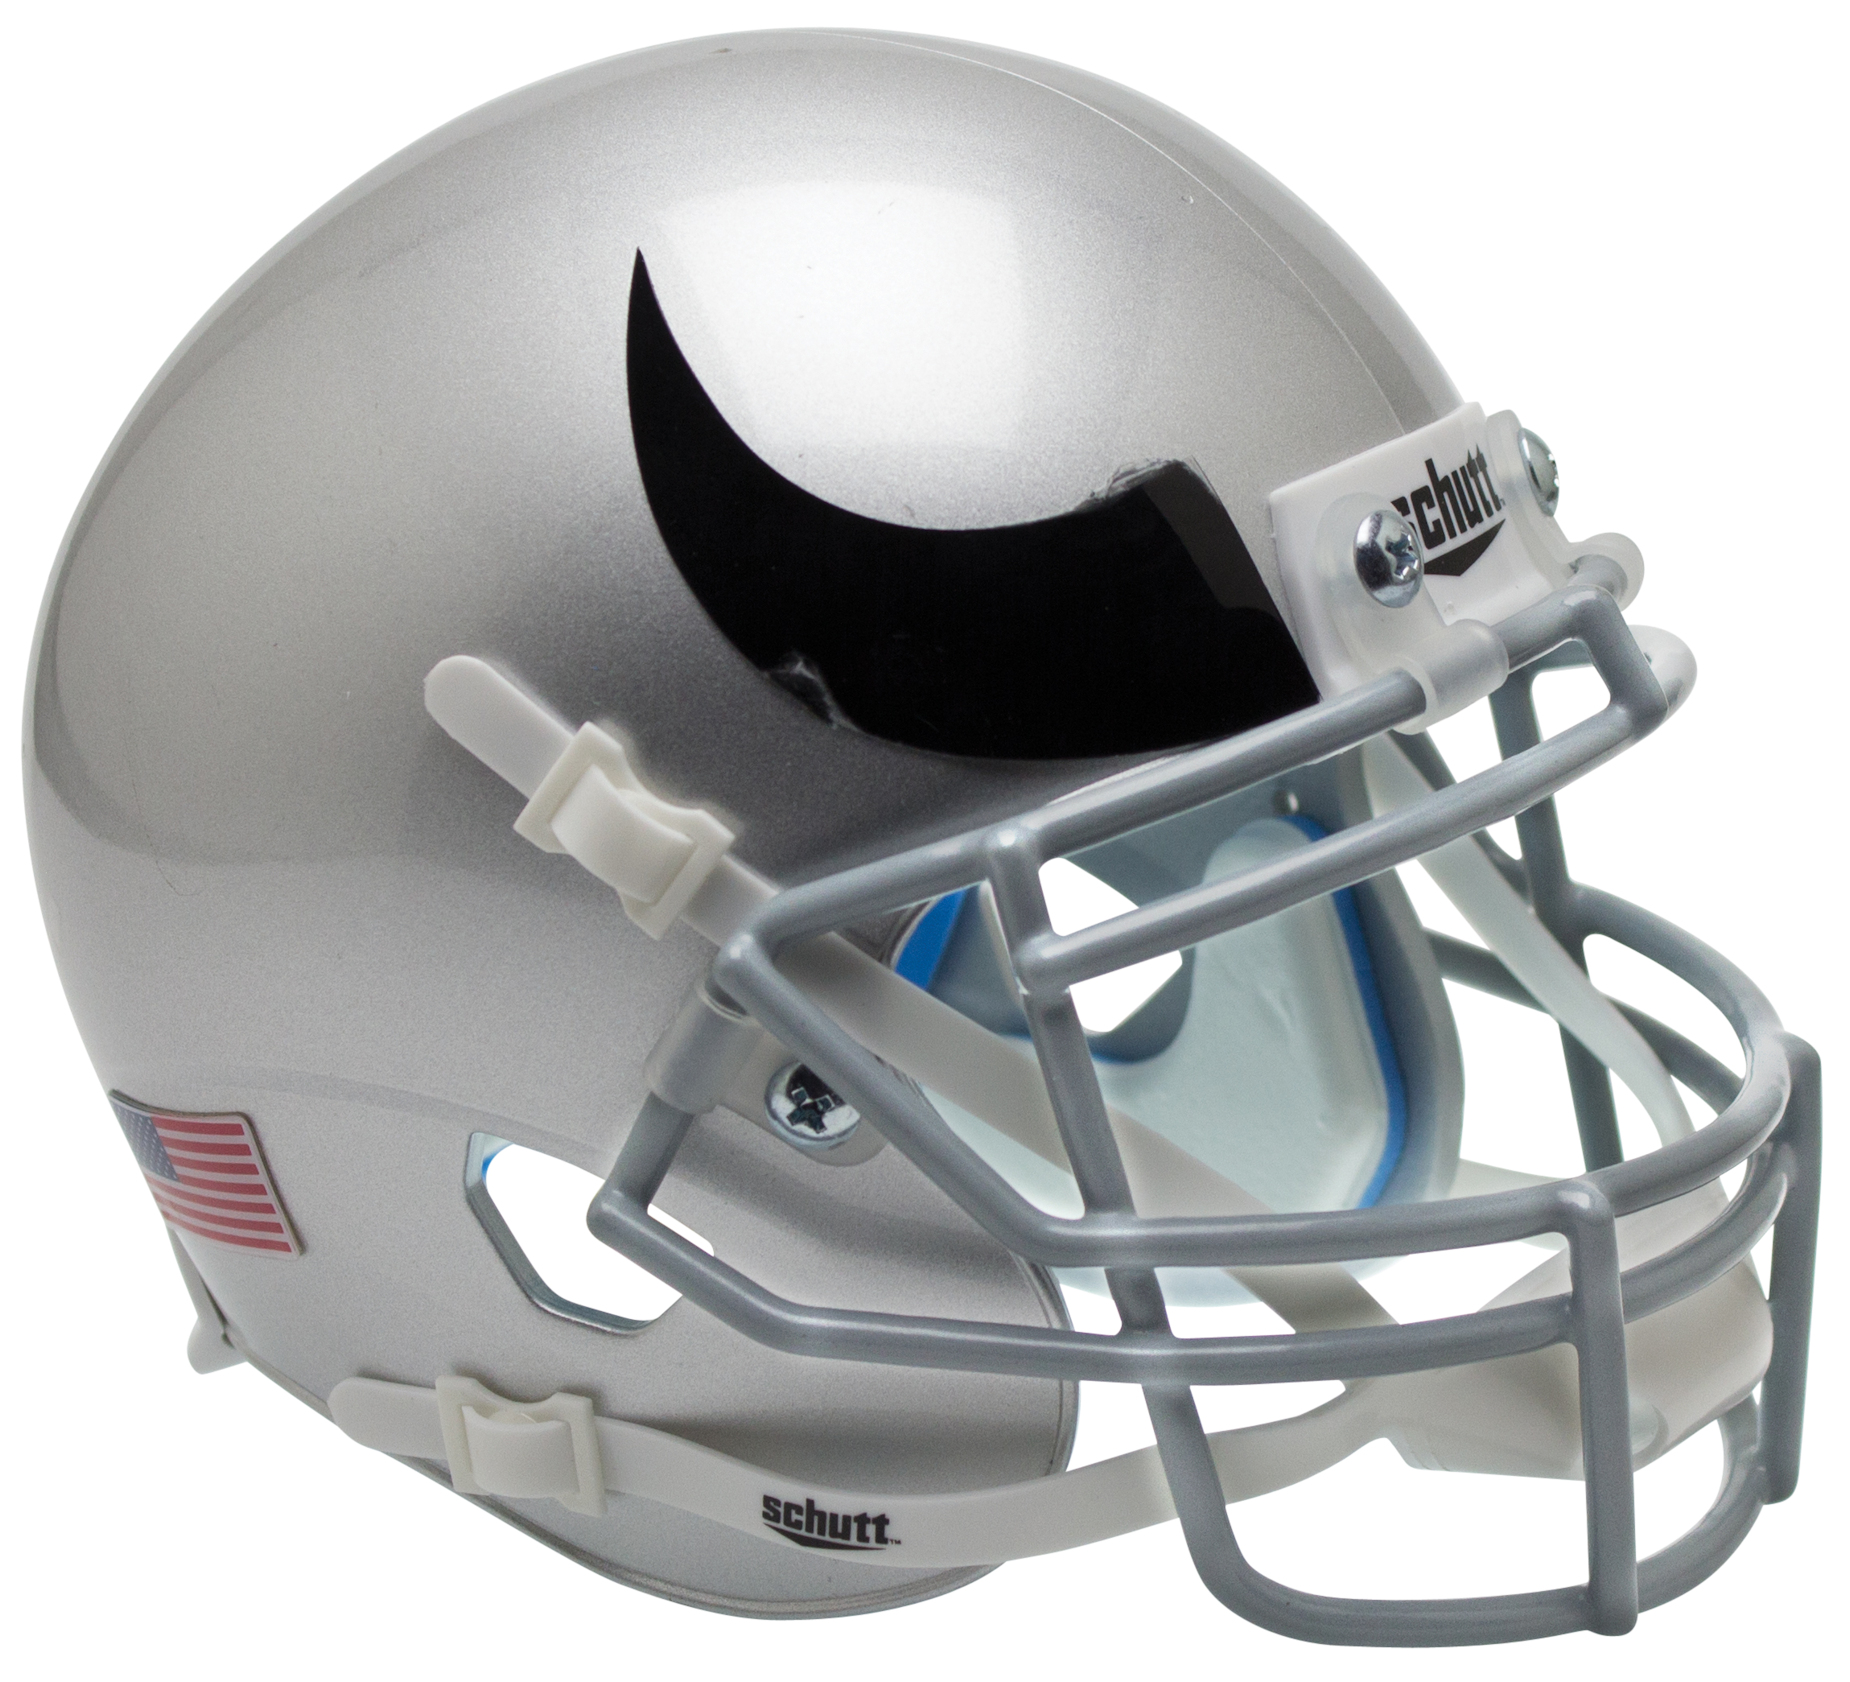 Colorado Buffaloes Authentic College XP Football Helmet Schutt <B>Horn</B>